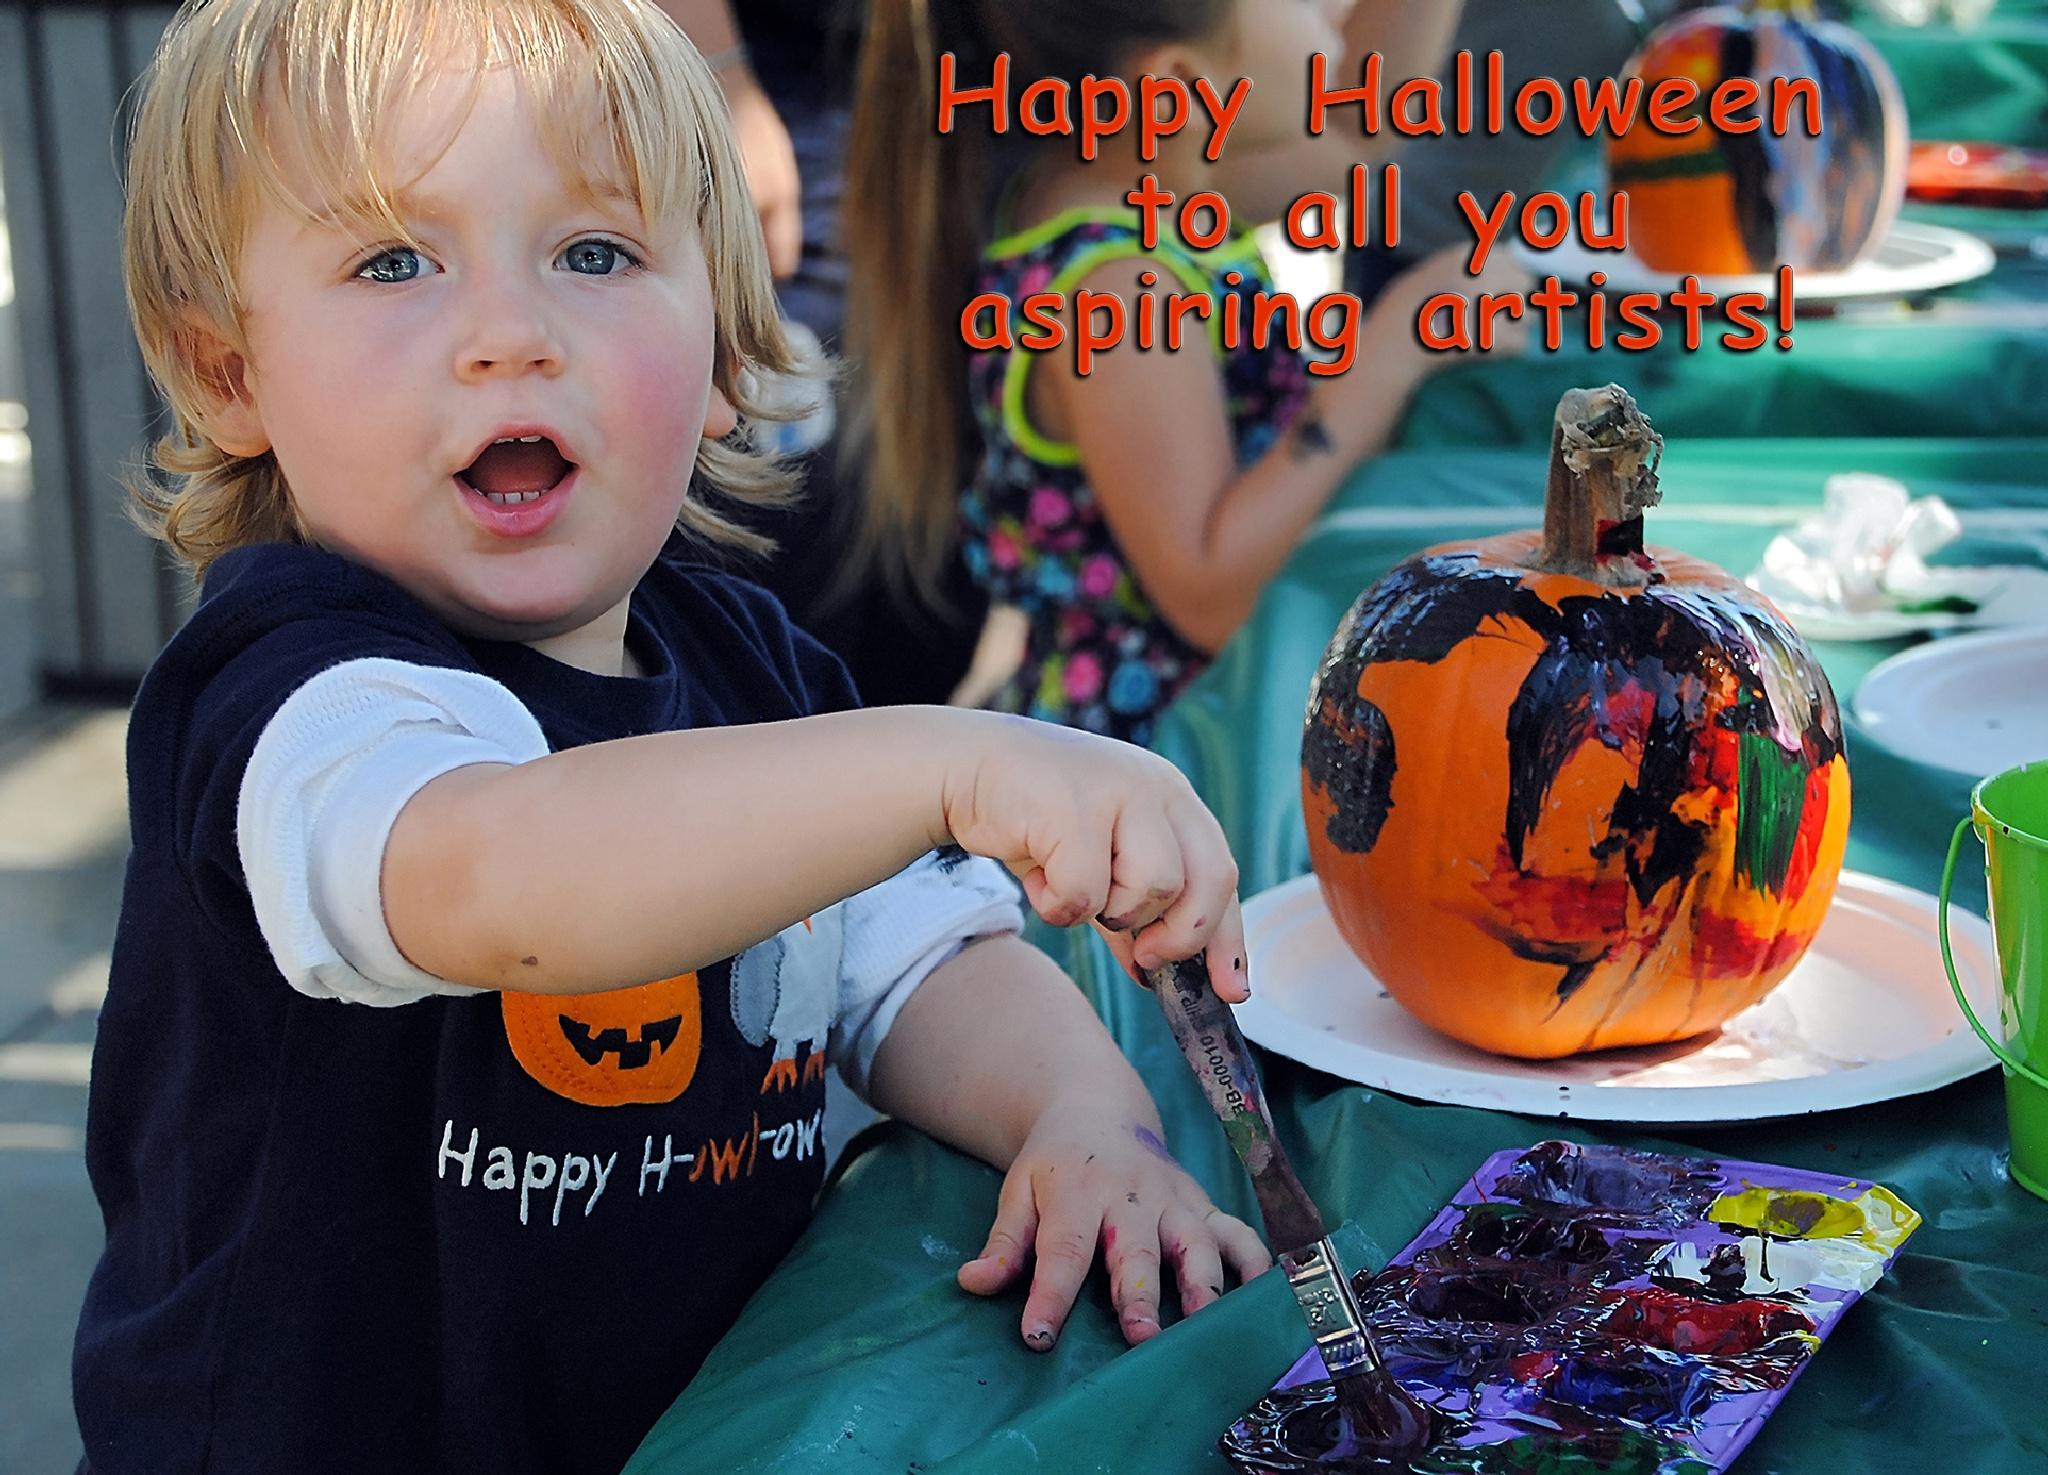 Little Halloween Artist by Lormet-Images